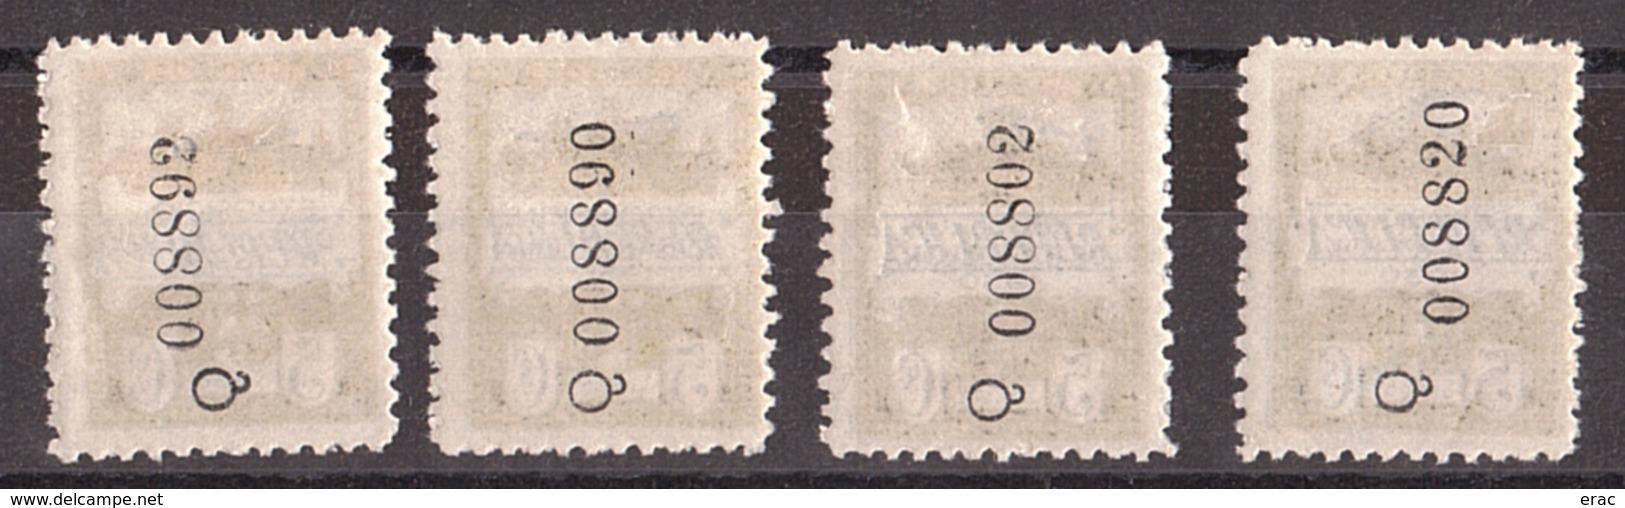 Barcelone - 1931 - N° 13 + 13a + 13b + 13c - Neufs * (tc) - 4 Surcharges Bleues Différentes - Barcelone